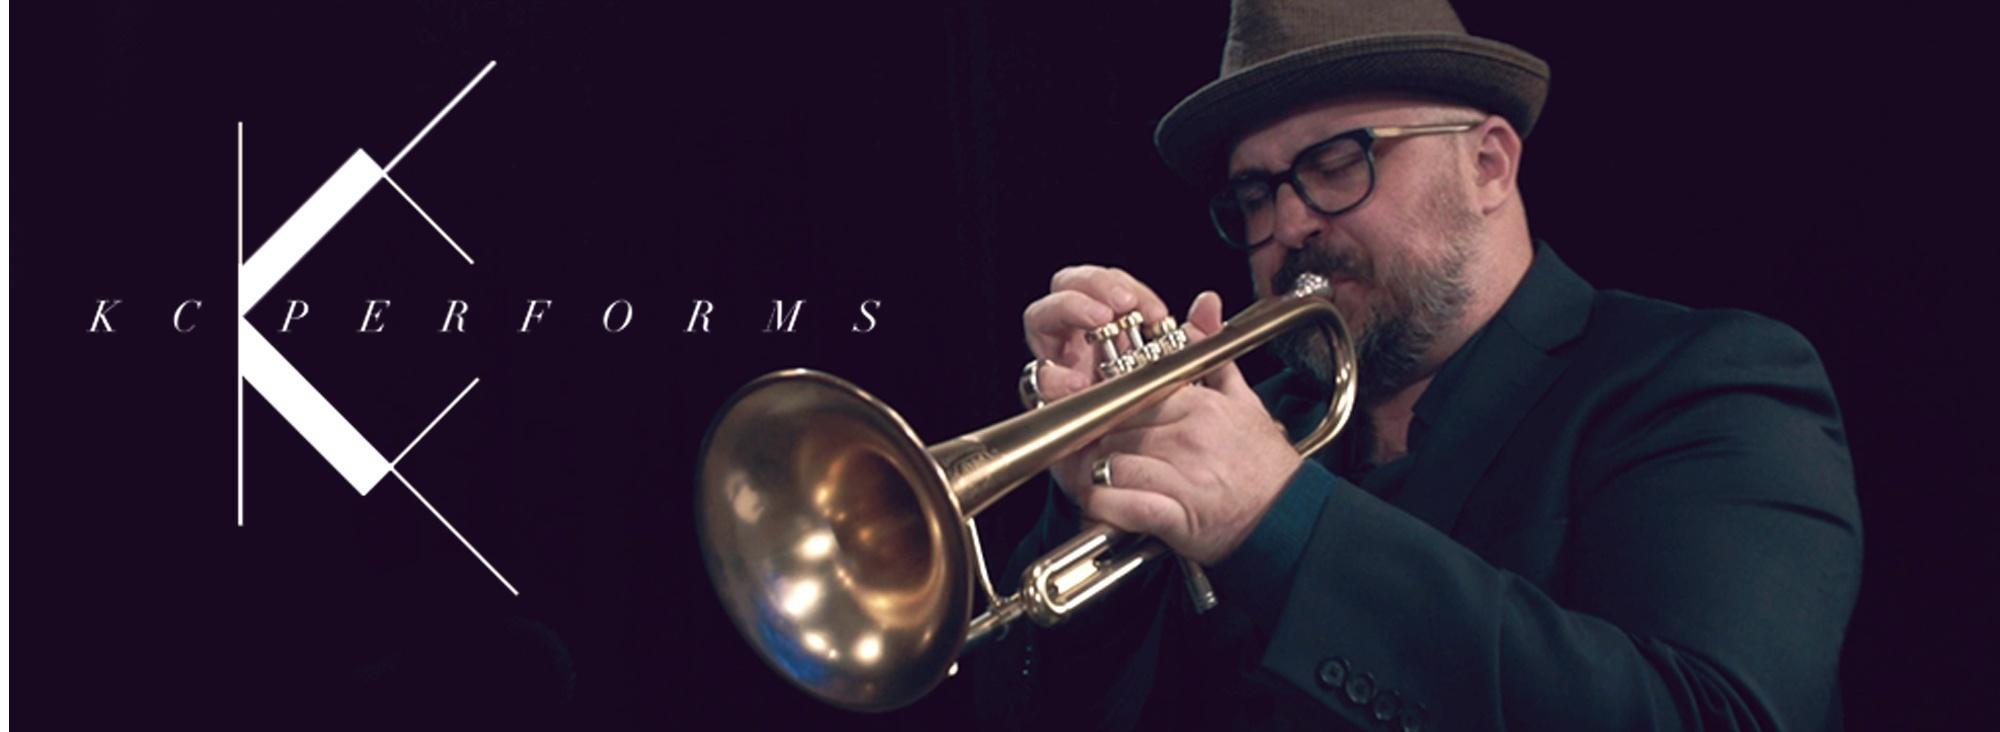 KC Performs logo, trumpeter playing